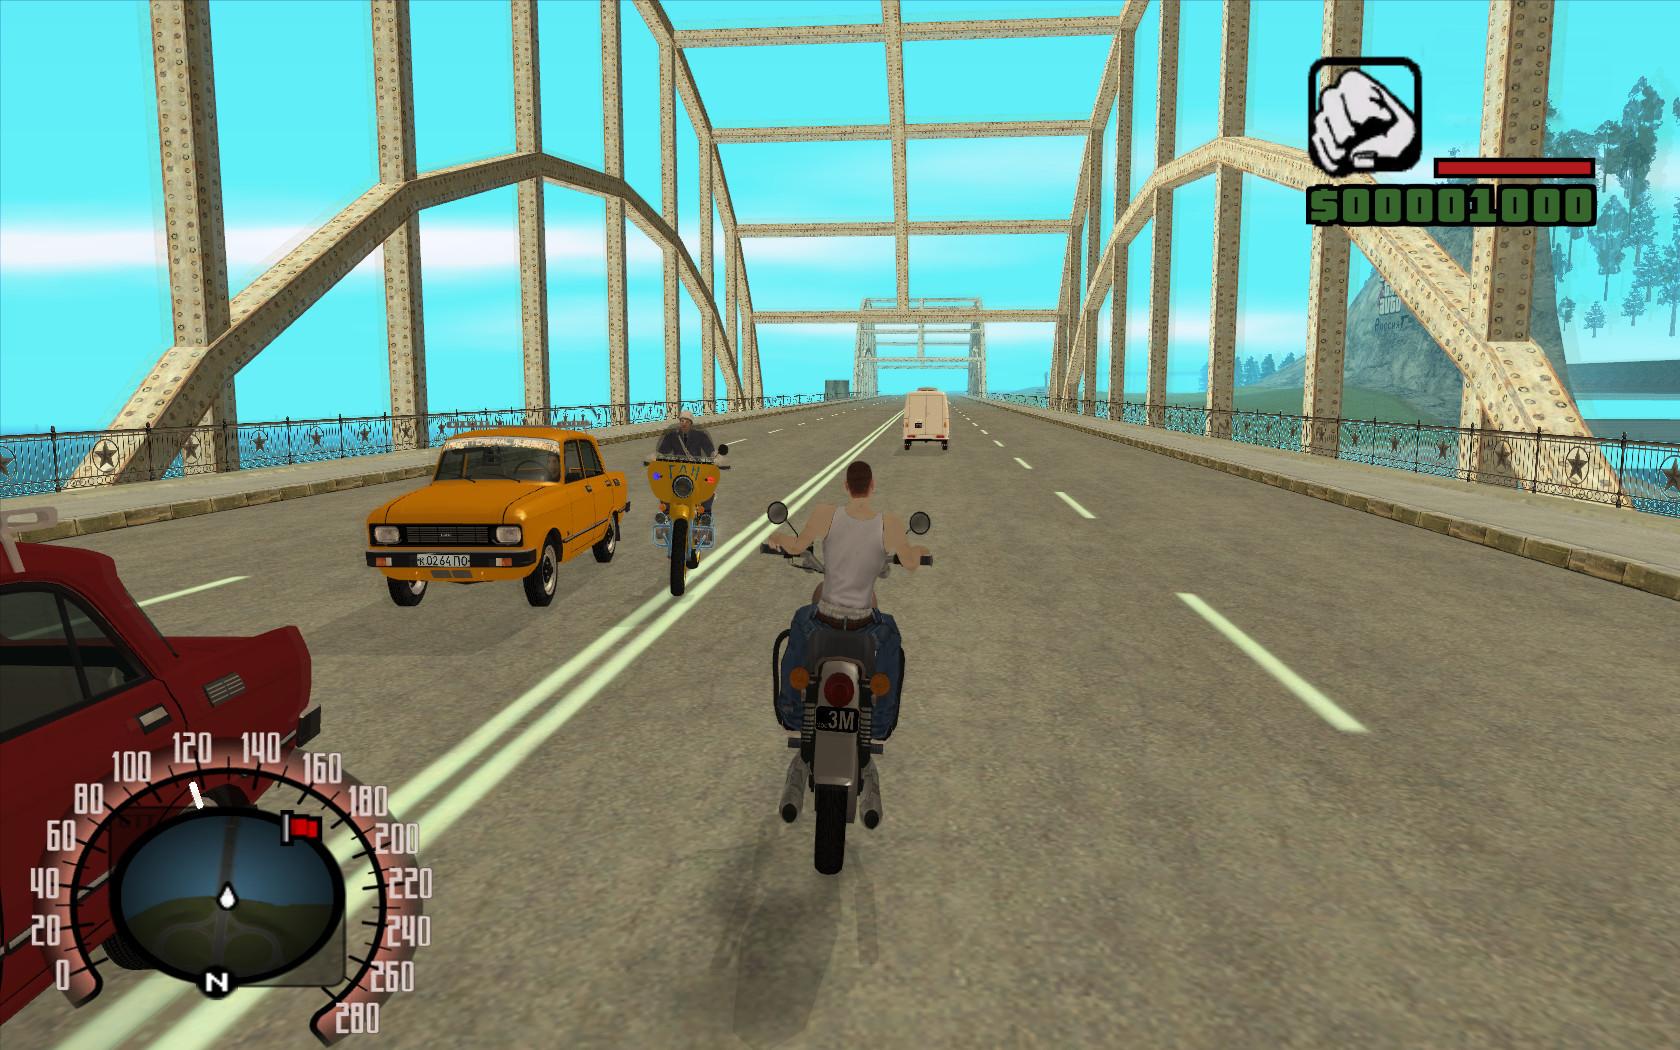 enb2016_5_7_15_21_15.jpg - Grand Theft Auto: San Andreas